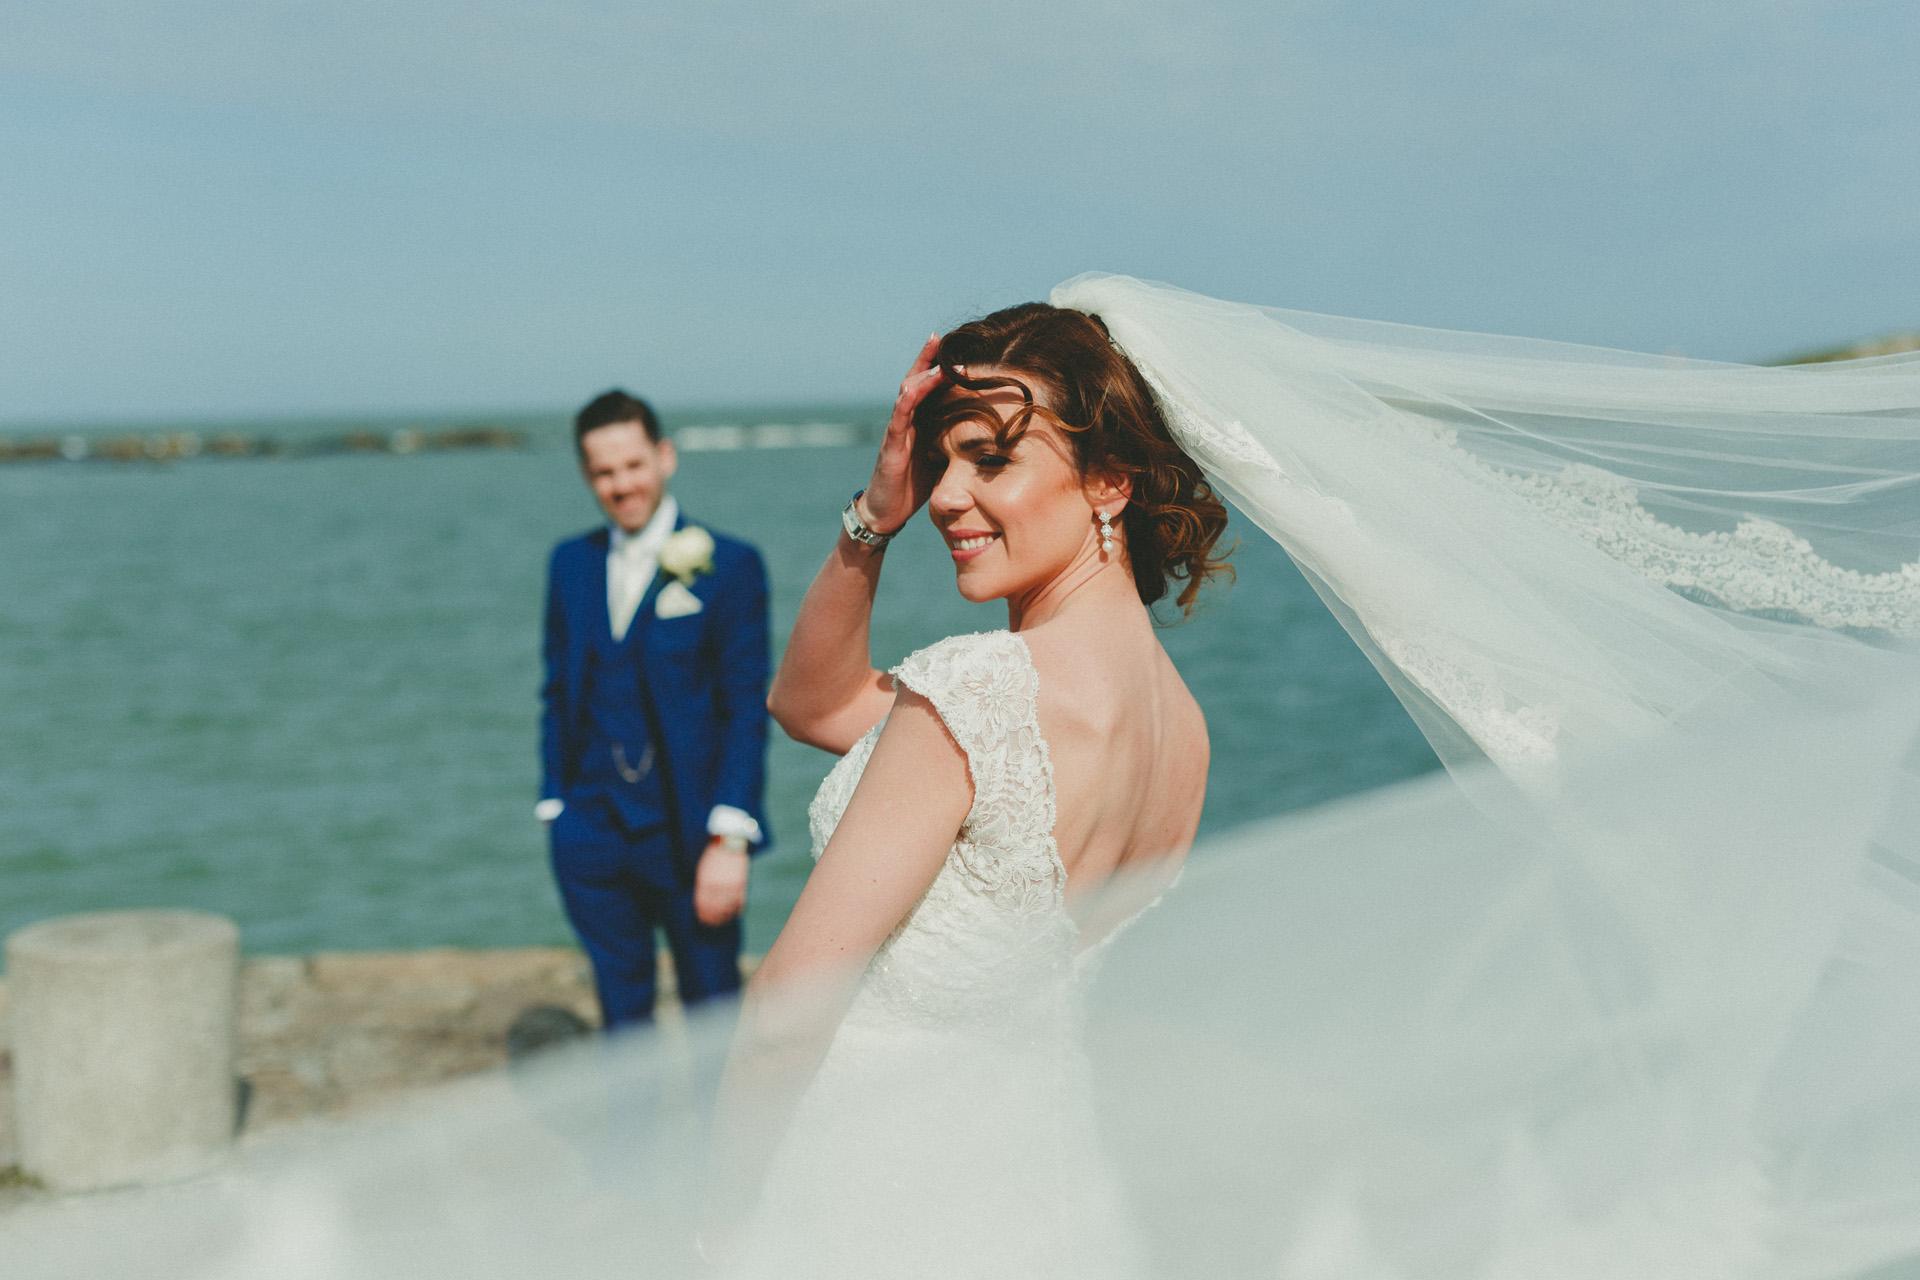 Royal-marine-hotel-wedding-photos2